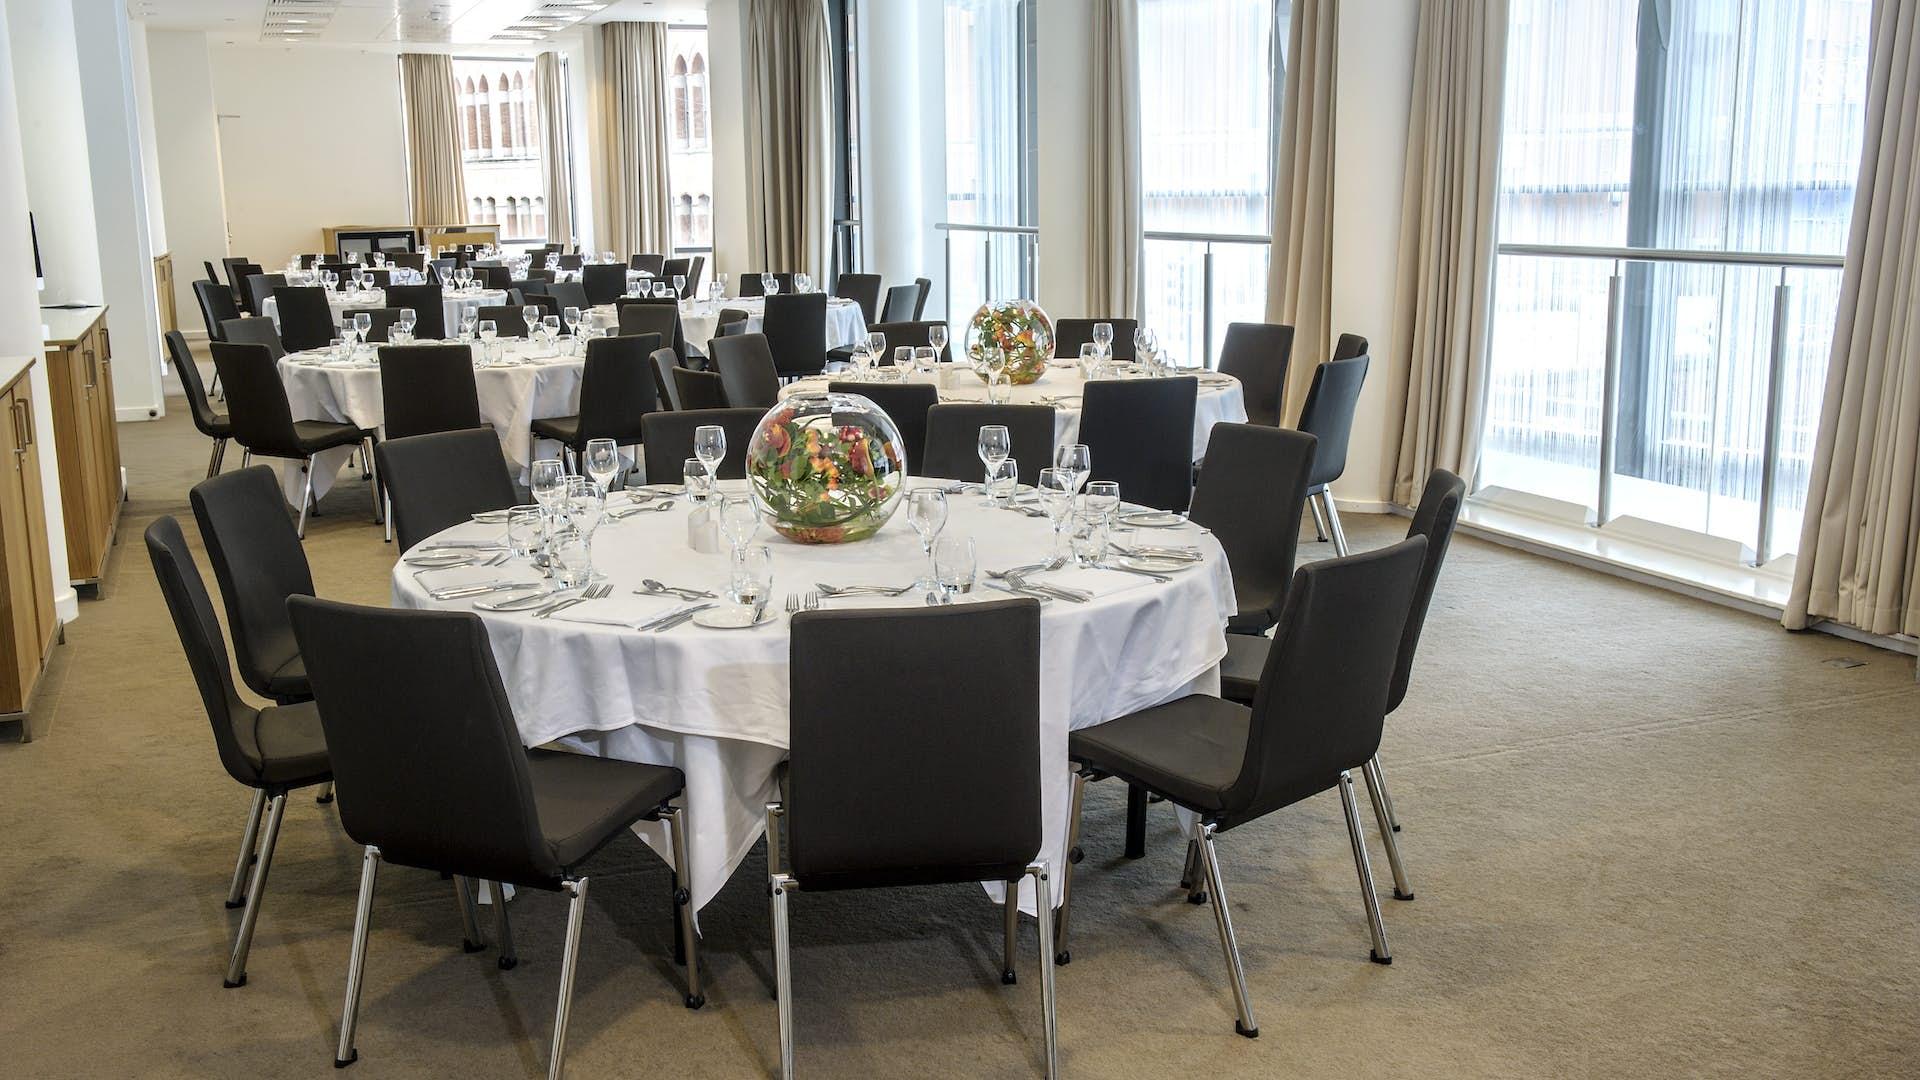 Doubletree Hilton Manchester Room Service Menu